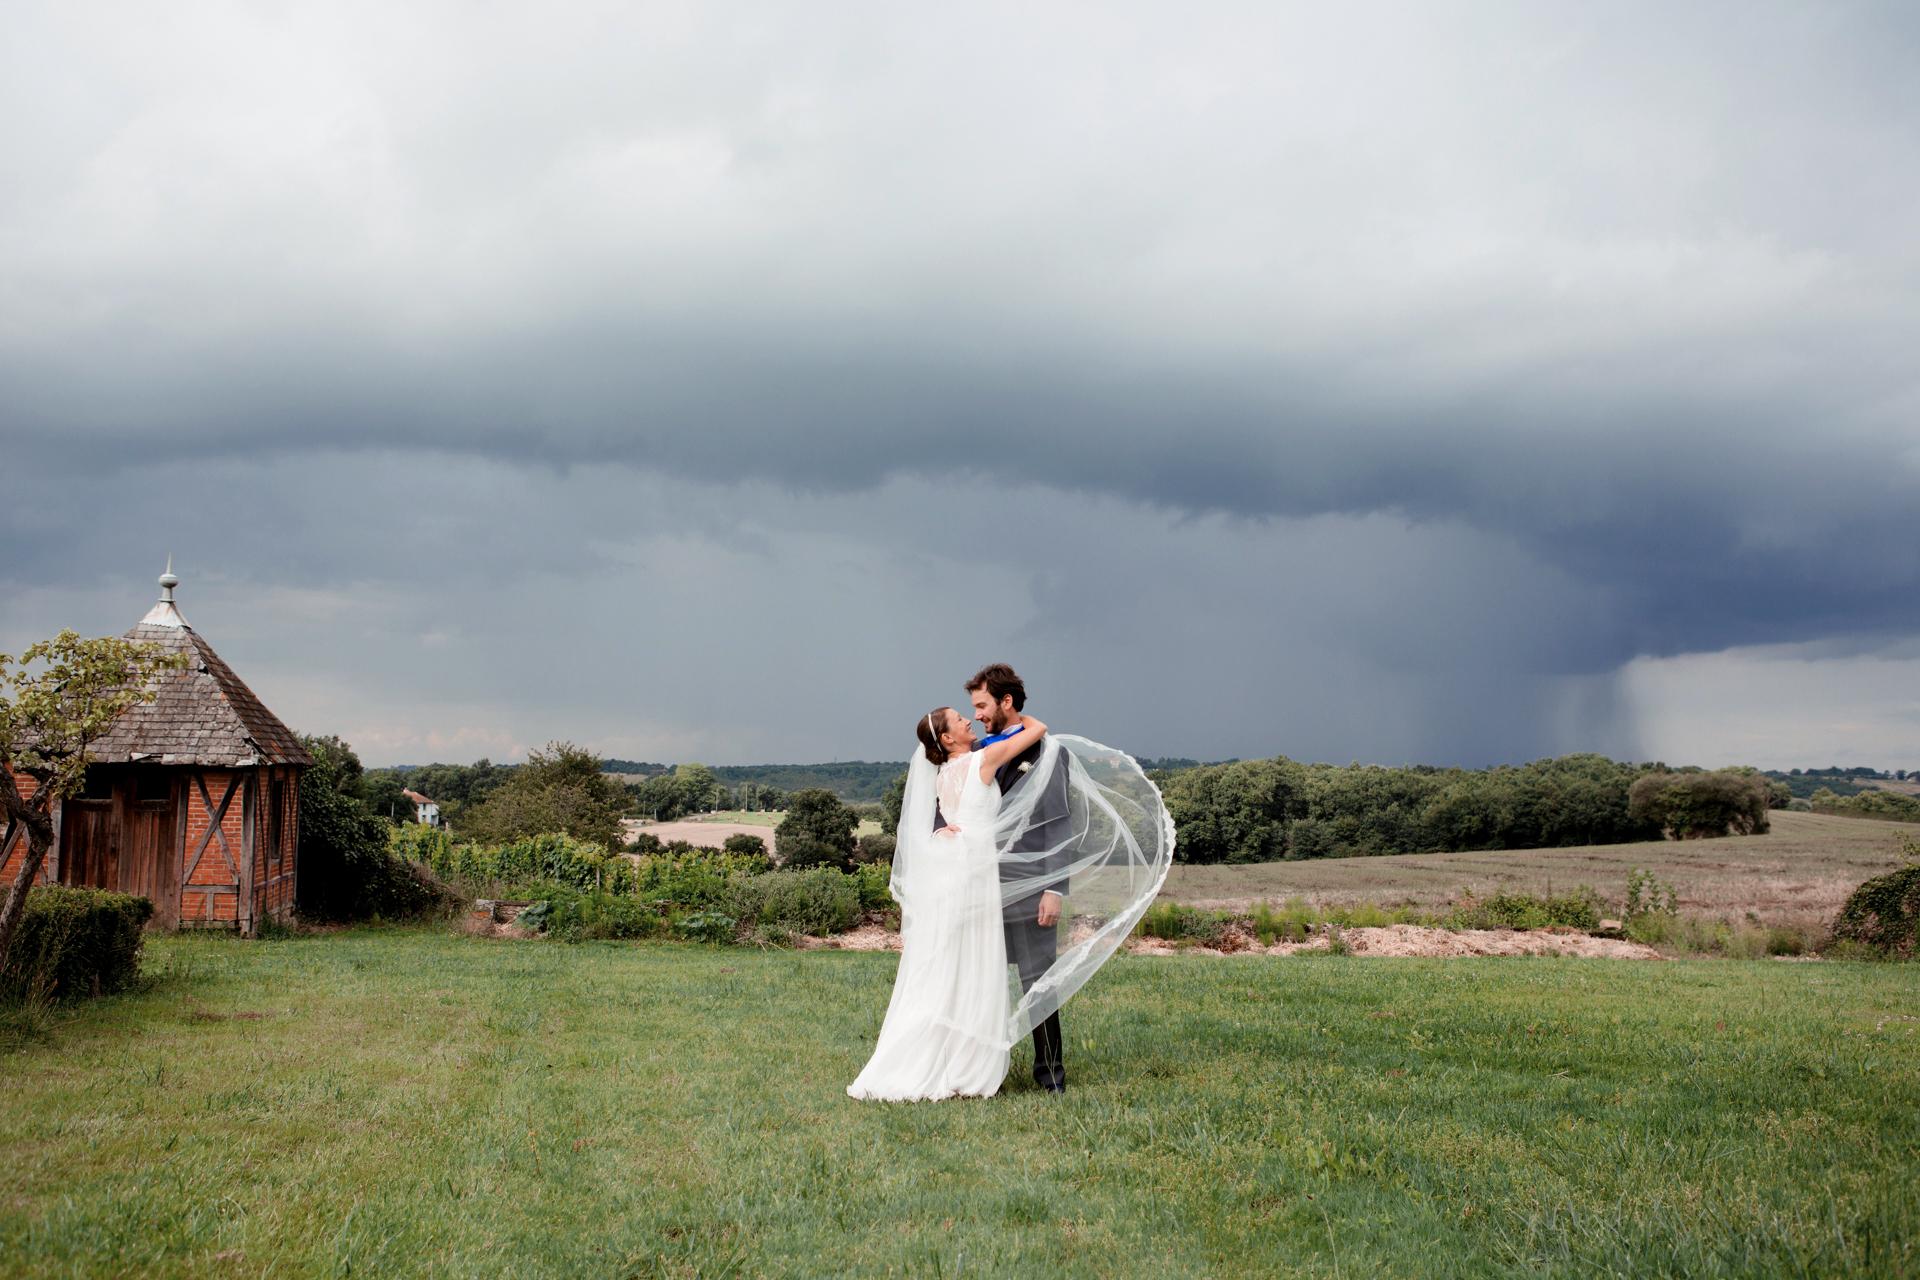 photographe-mariage-oise-paris-chantilly-senlis-keith-flament0119